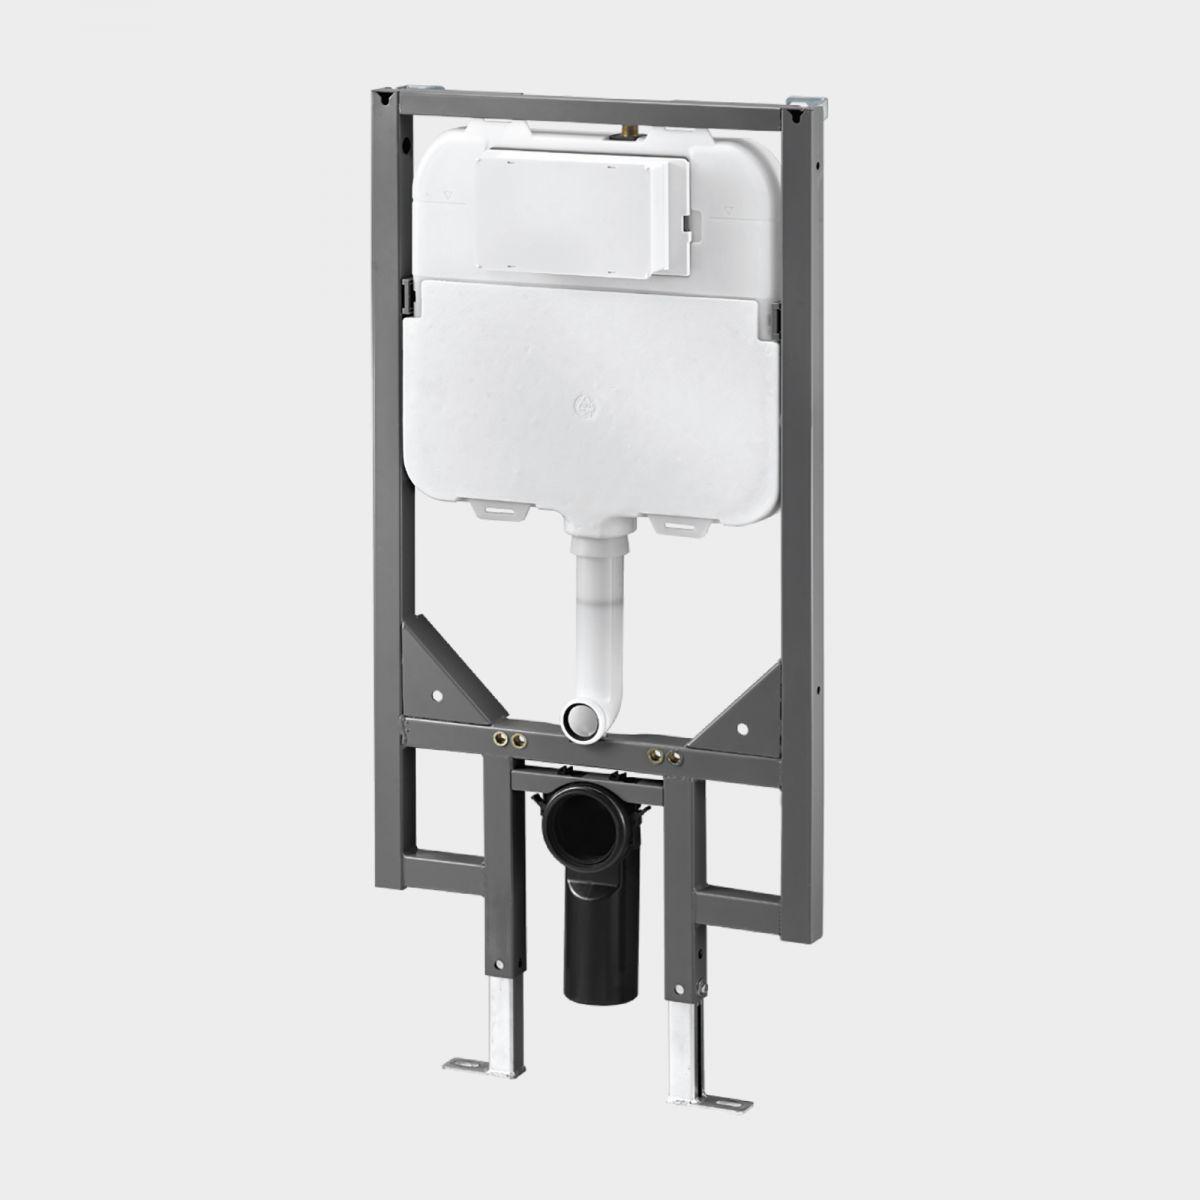 3D1.1004 In-Wall Cistern